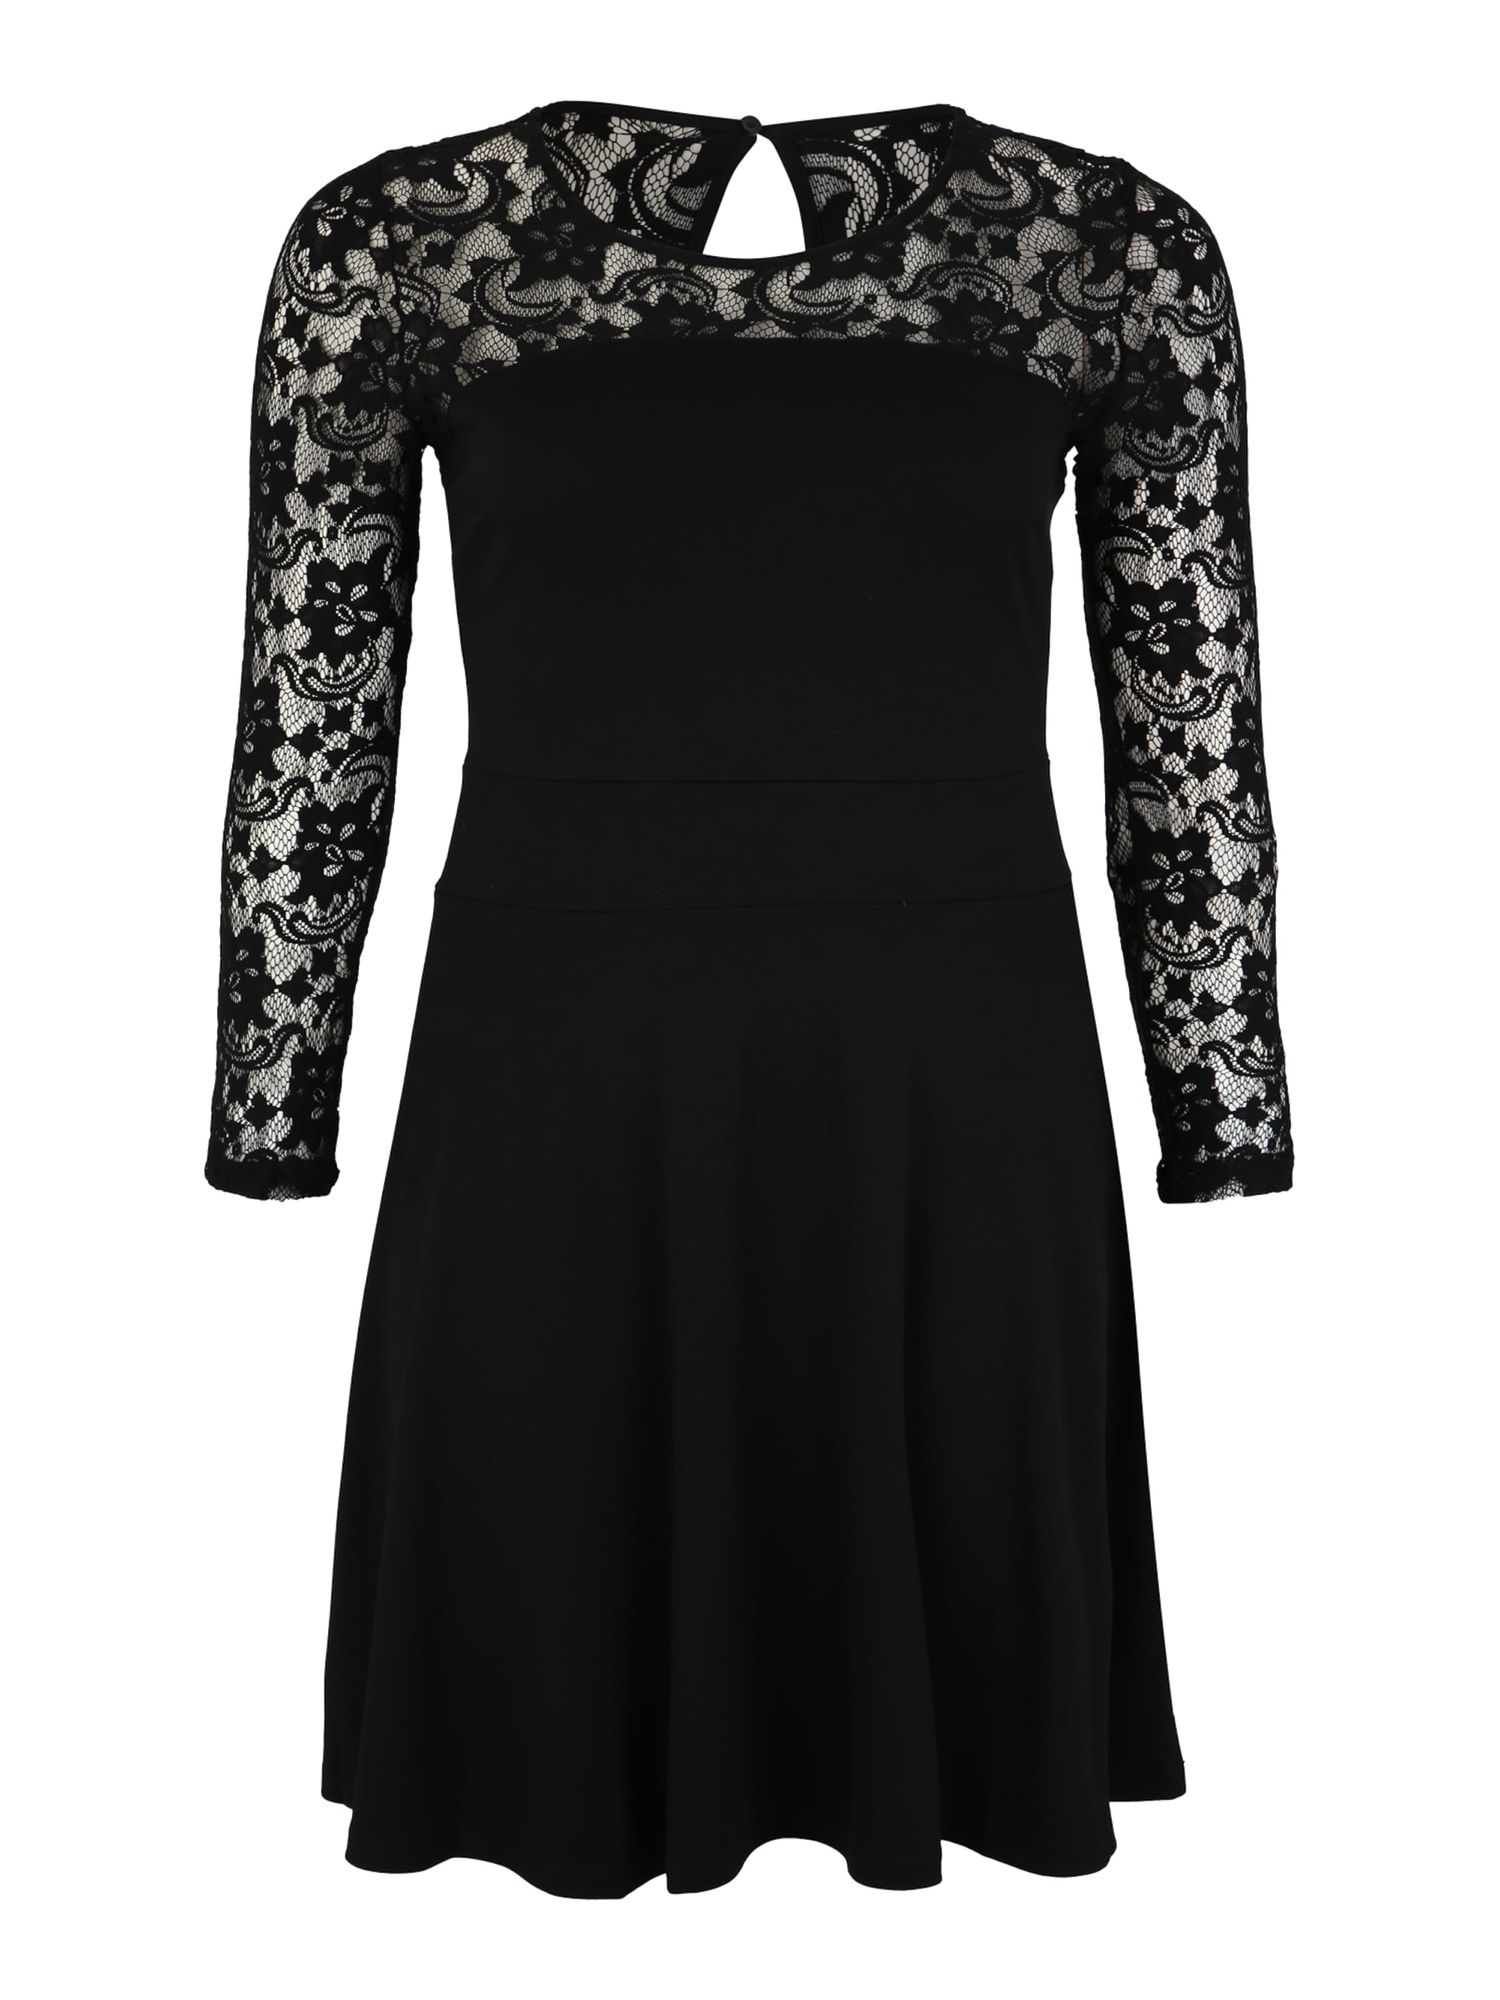 Kleid ´Jersey Dress with lace longsleeves´